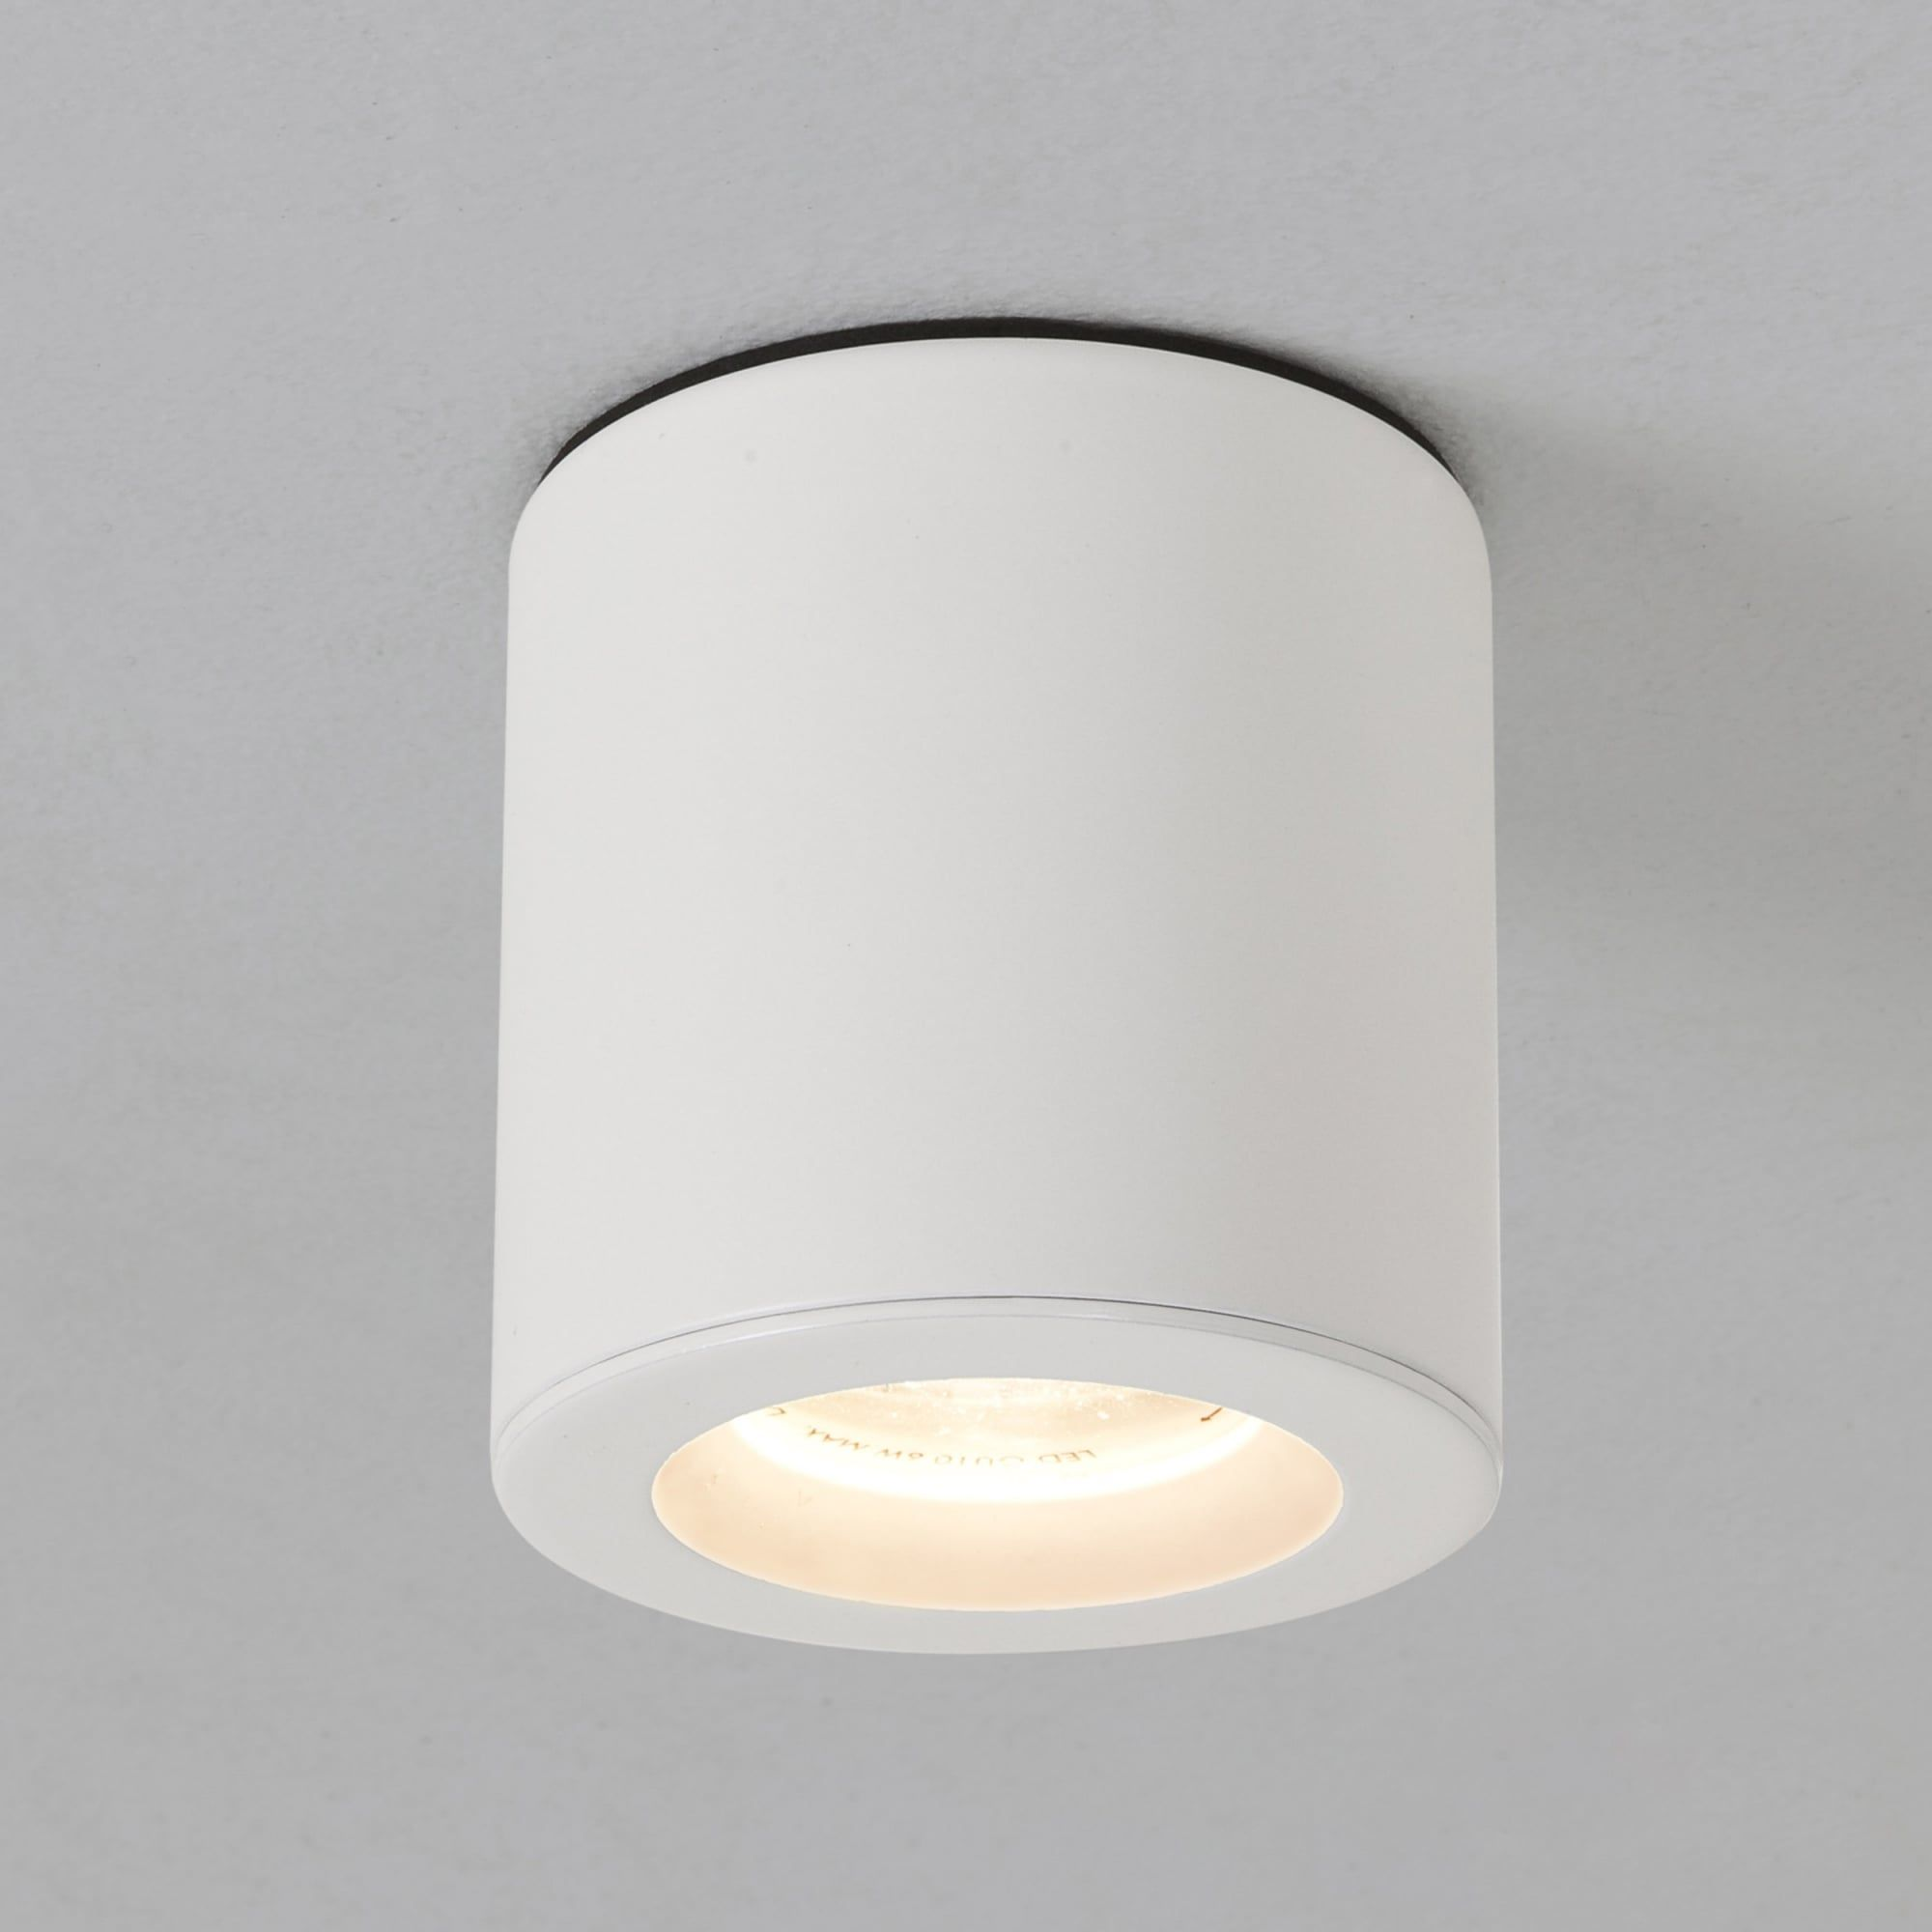 Astro lighting kos surface mounted downlight ip in white